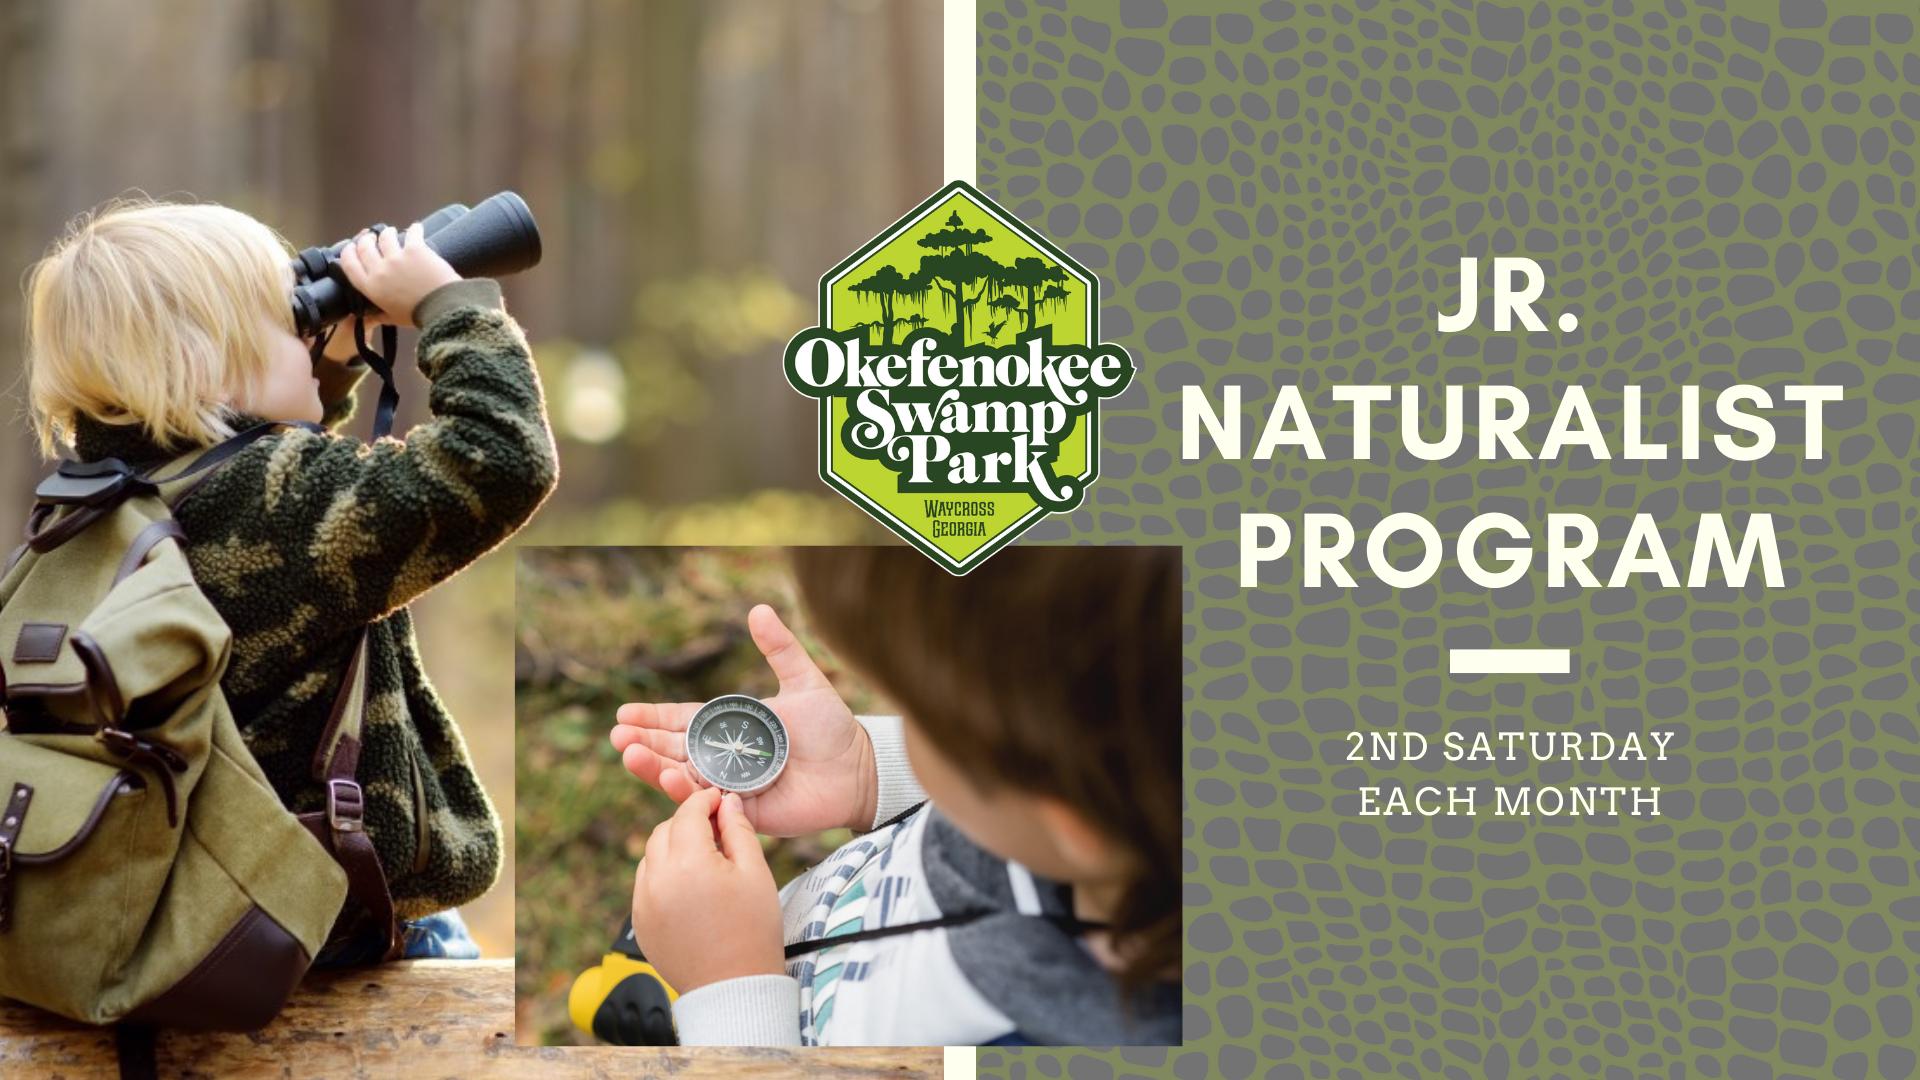 Jr Naturist Program at Okefenokee Swamp Park